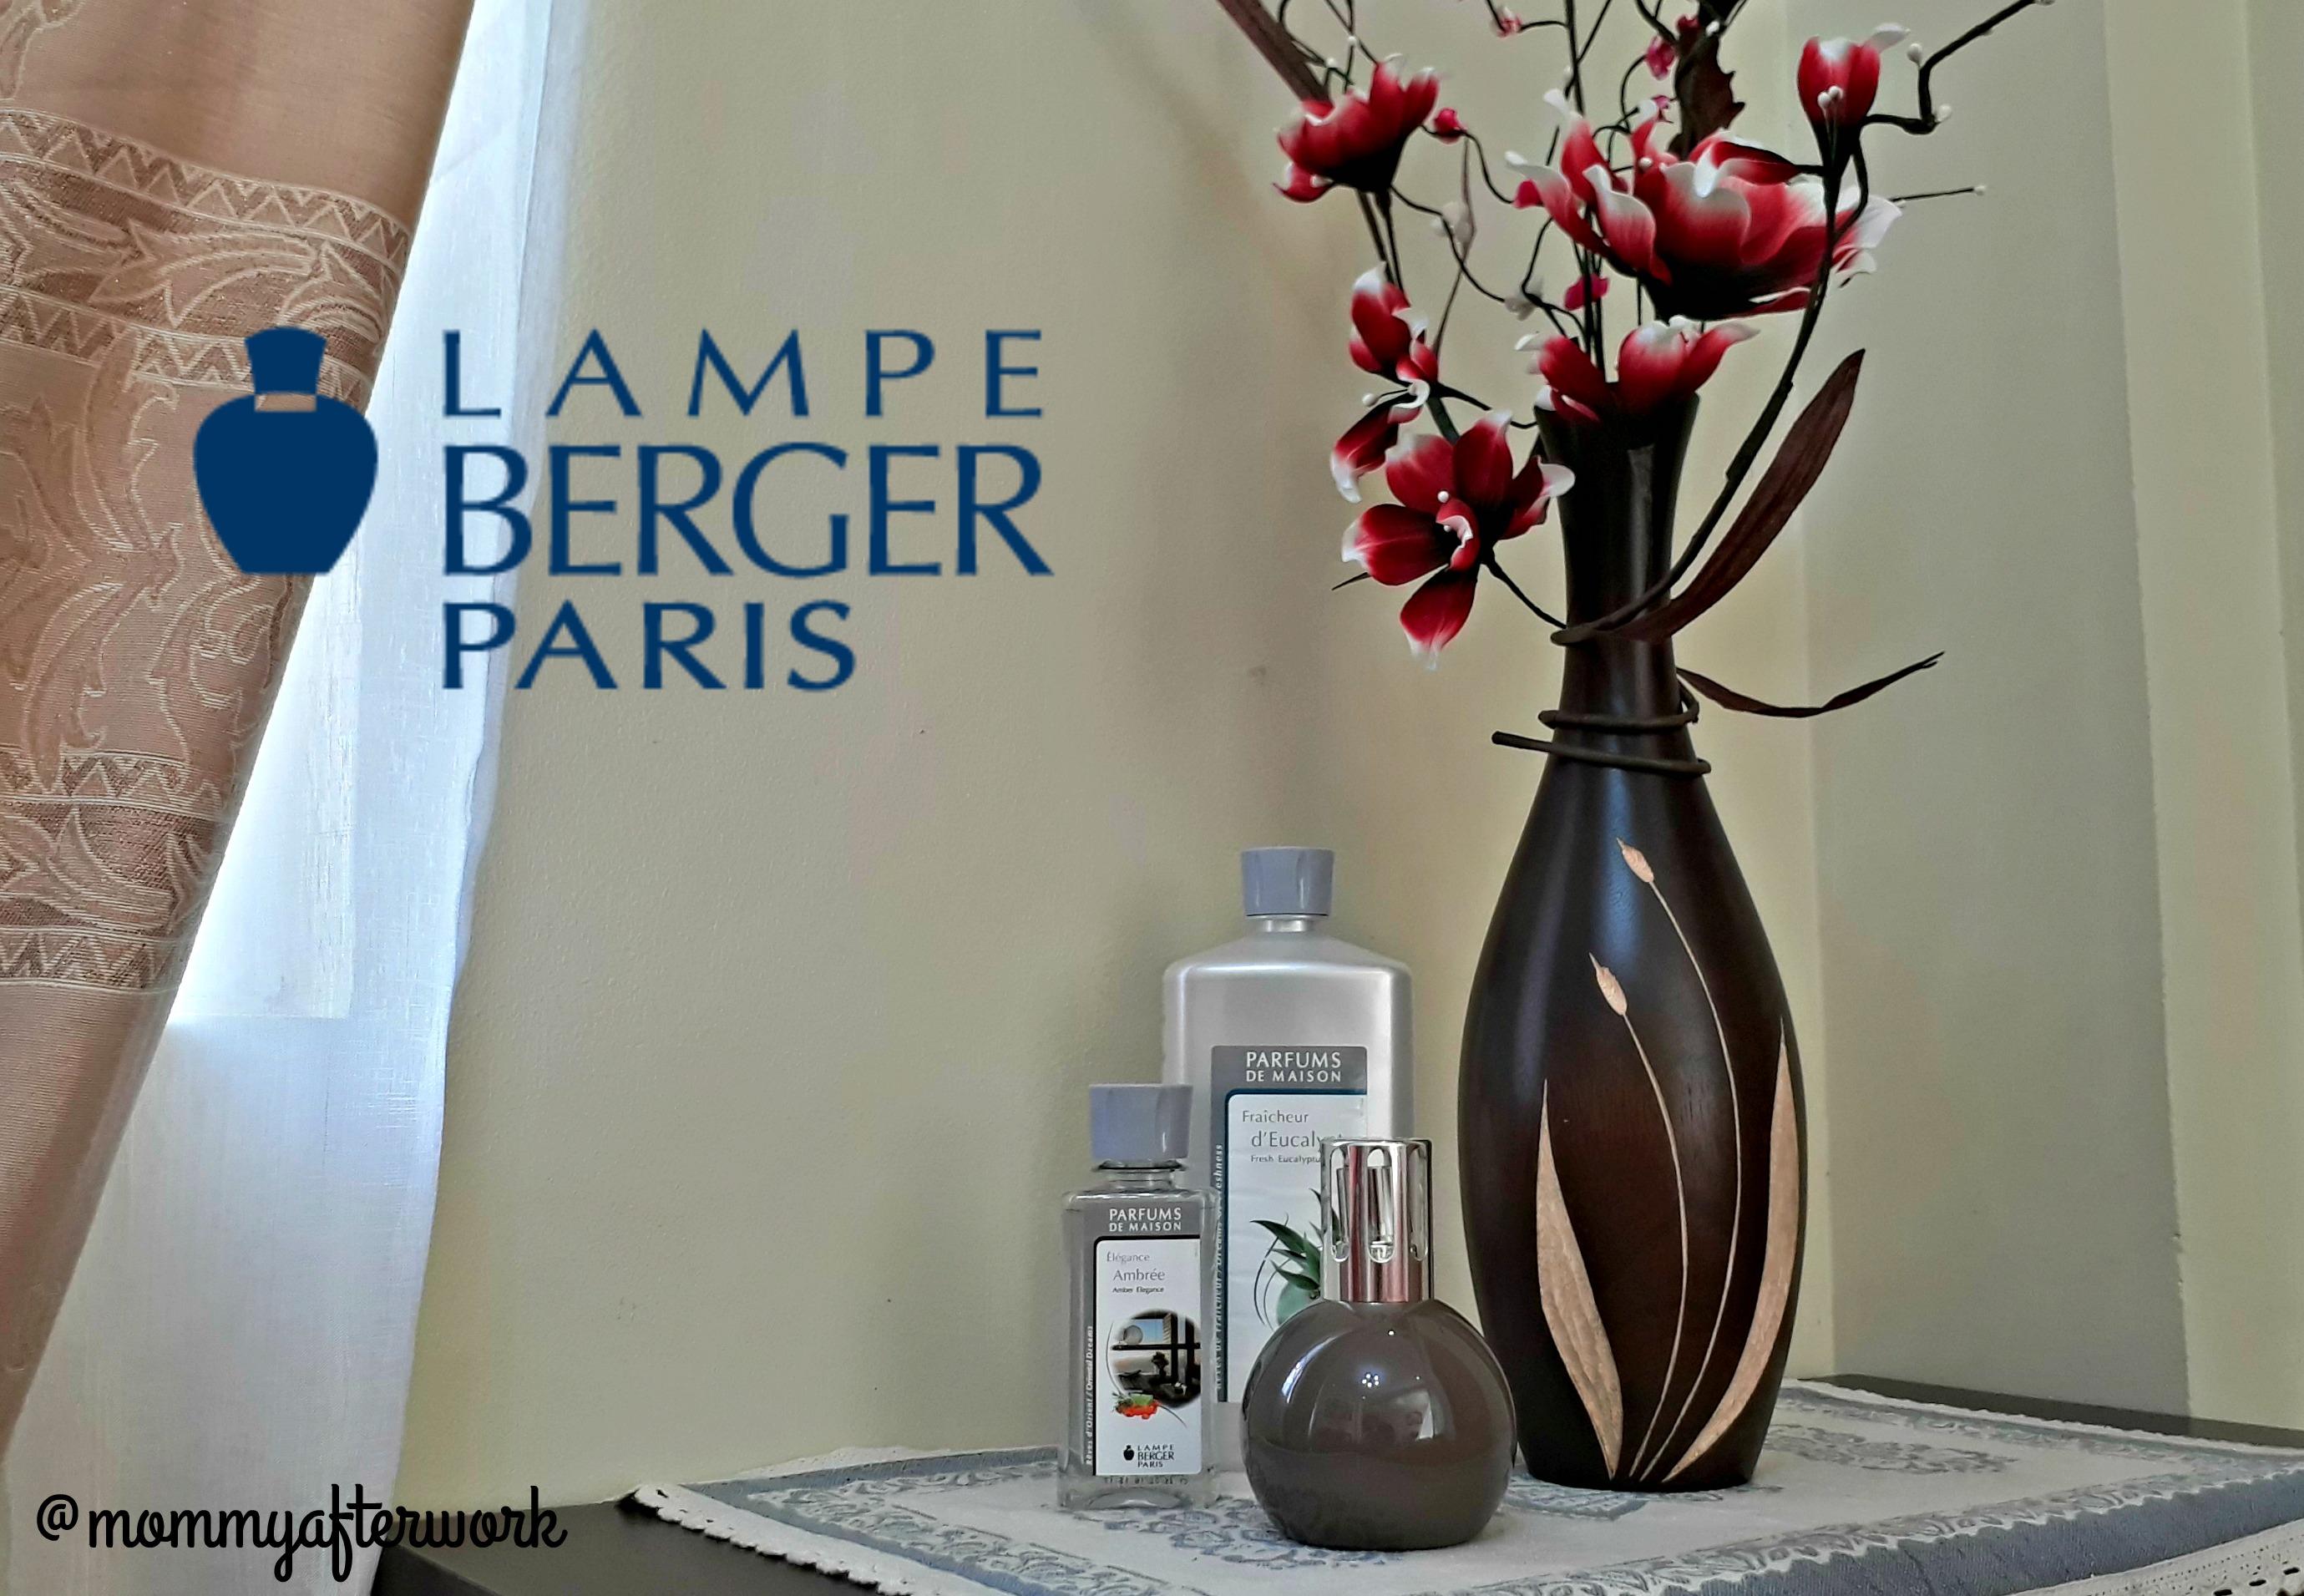 LampeBergerParis_LampAtHome